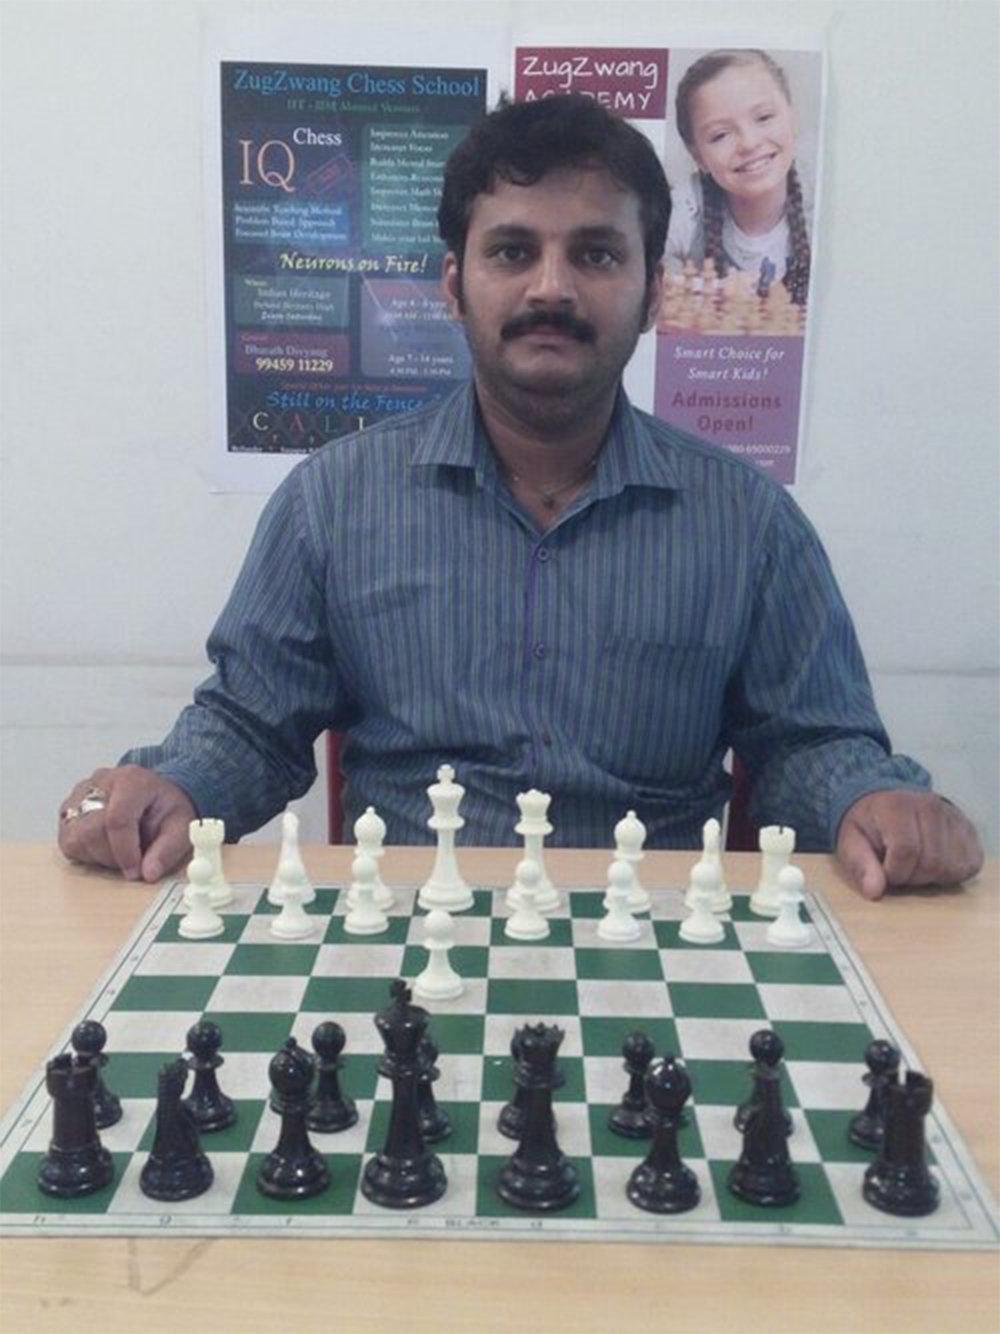 Name: Vinayak Kumar Coach Level: Level C Target Students: Beginner Experience: 2+ years Availability: No